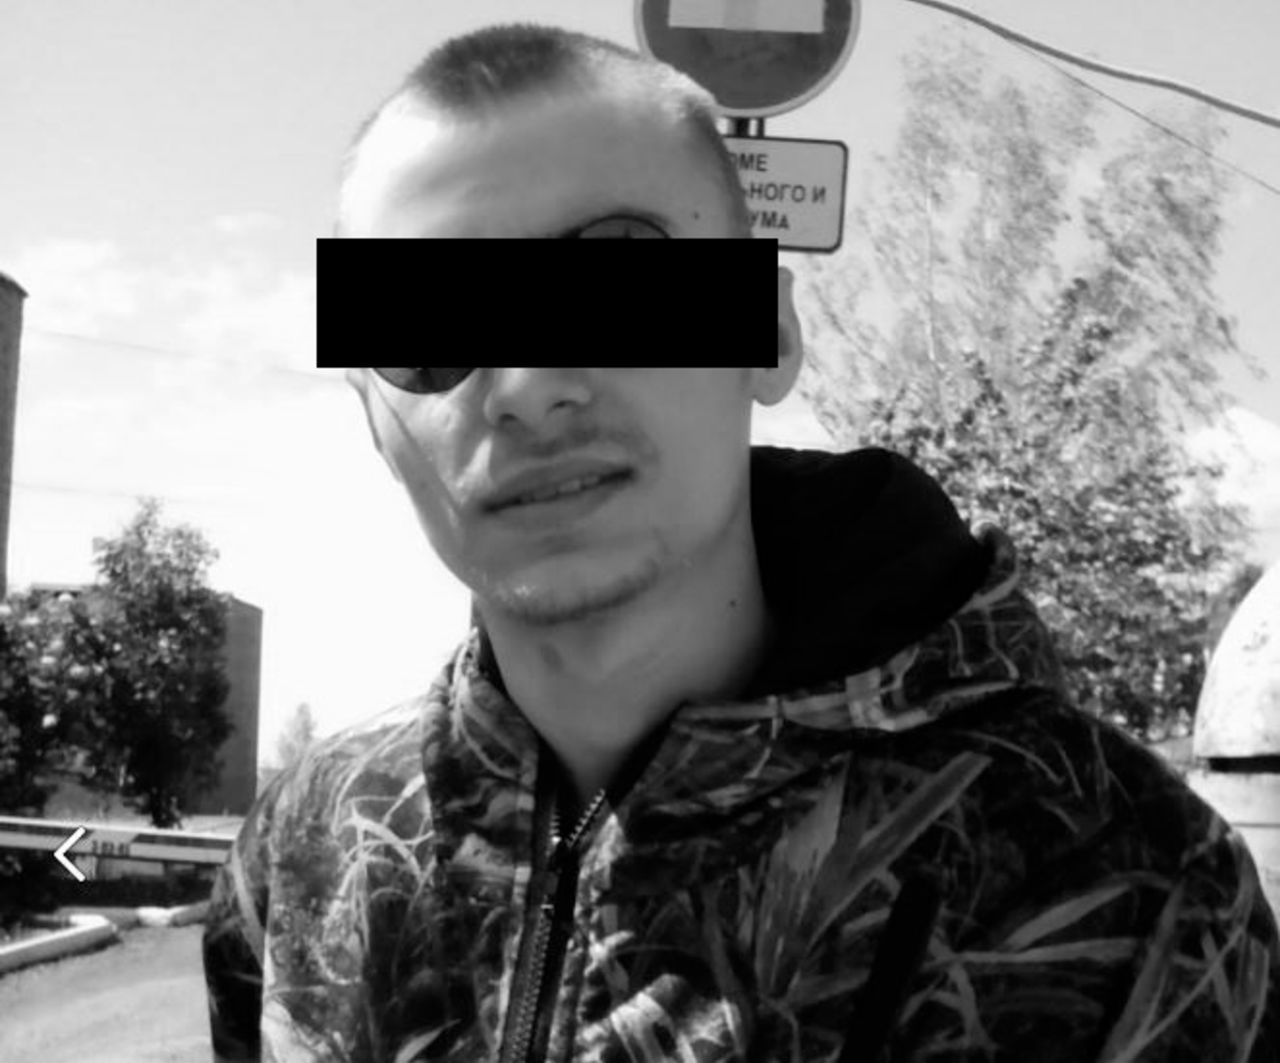 ВКузбассе умер 16-летний ученик техникума